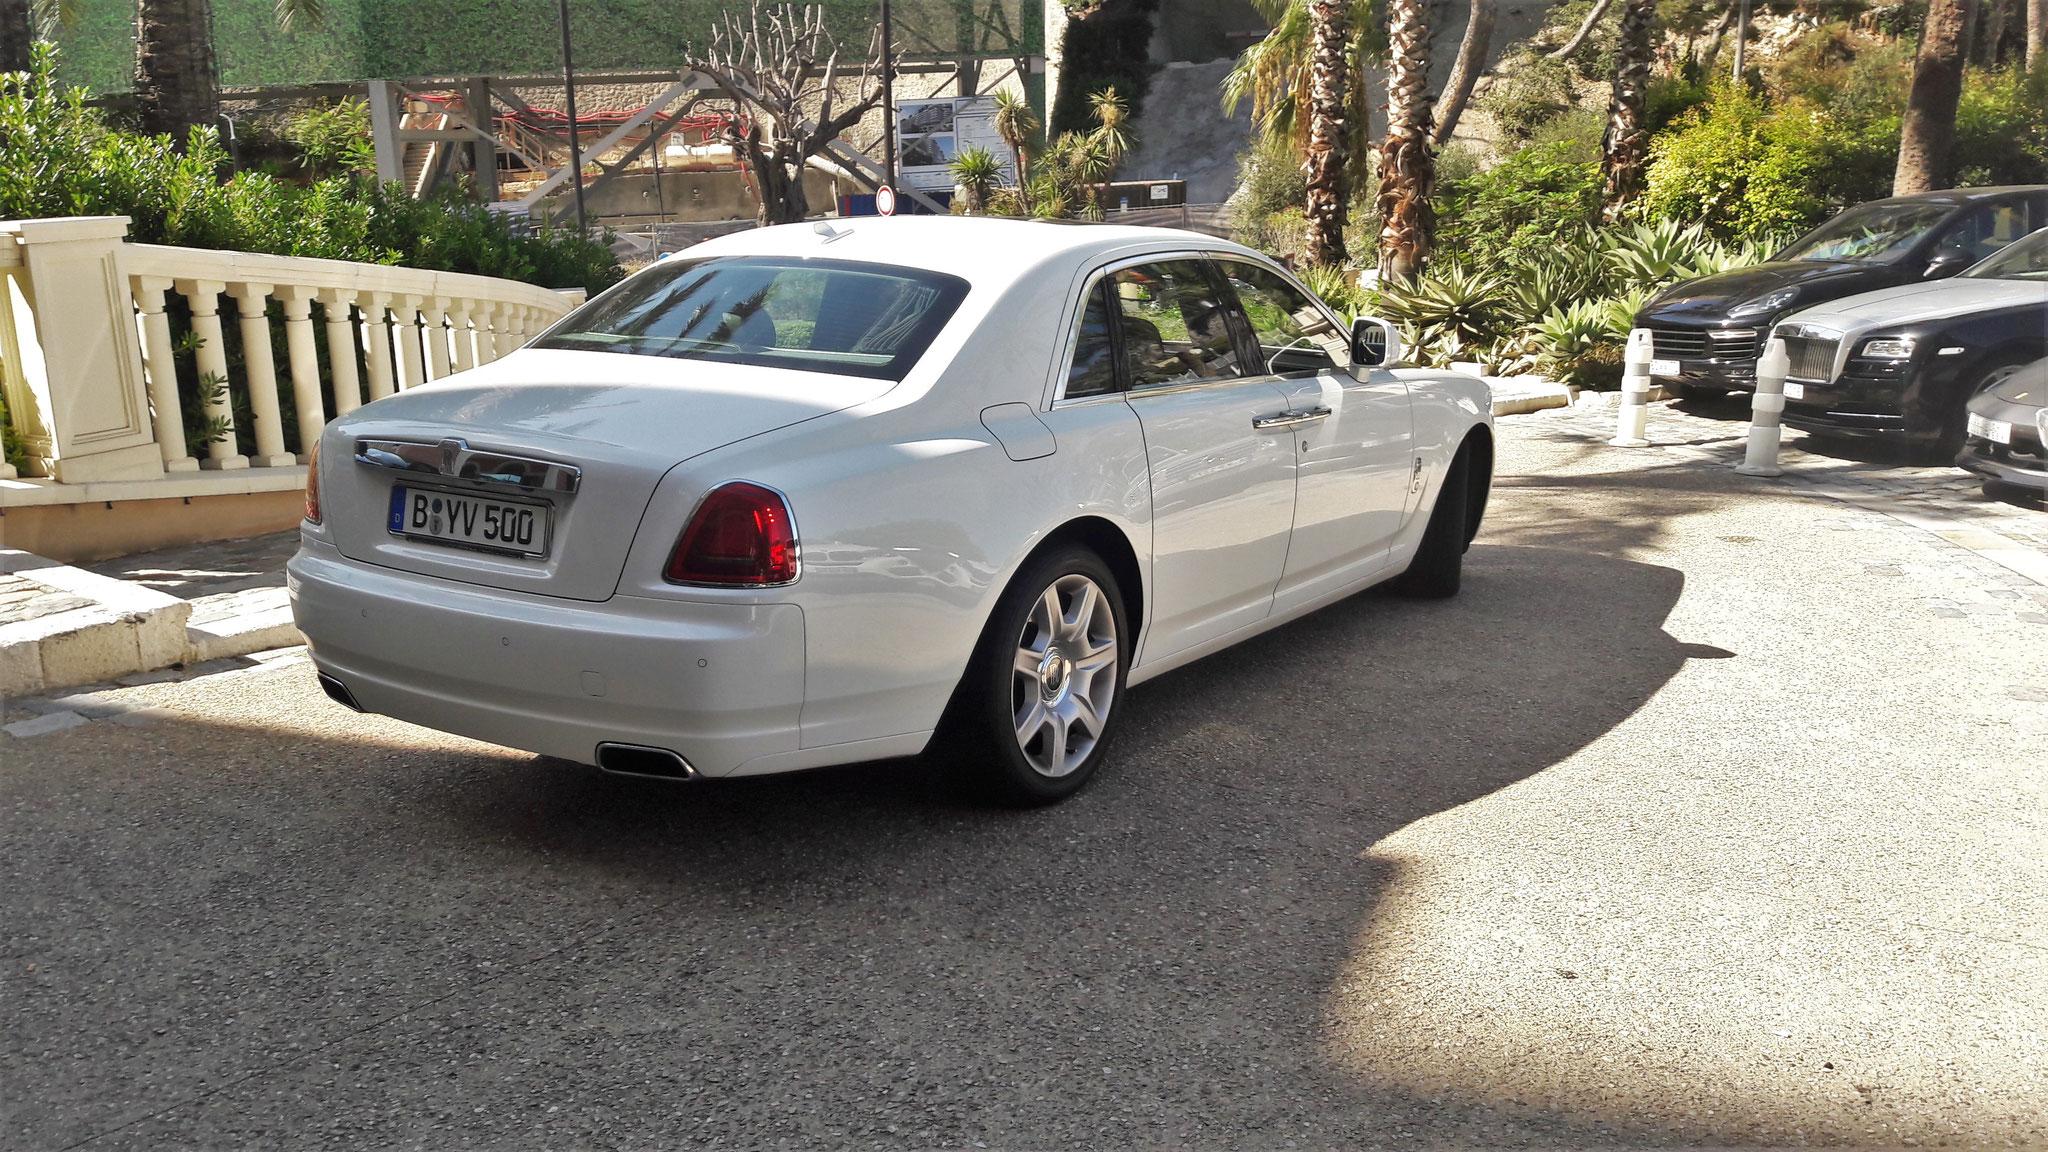 Rolls Royce Ghost Series II - B-YV-500